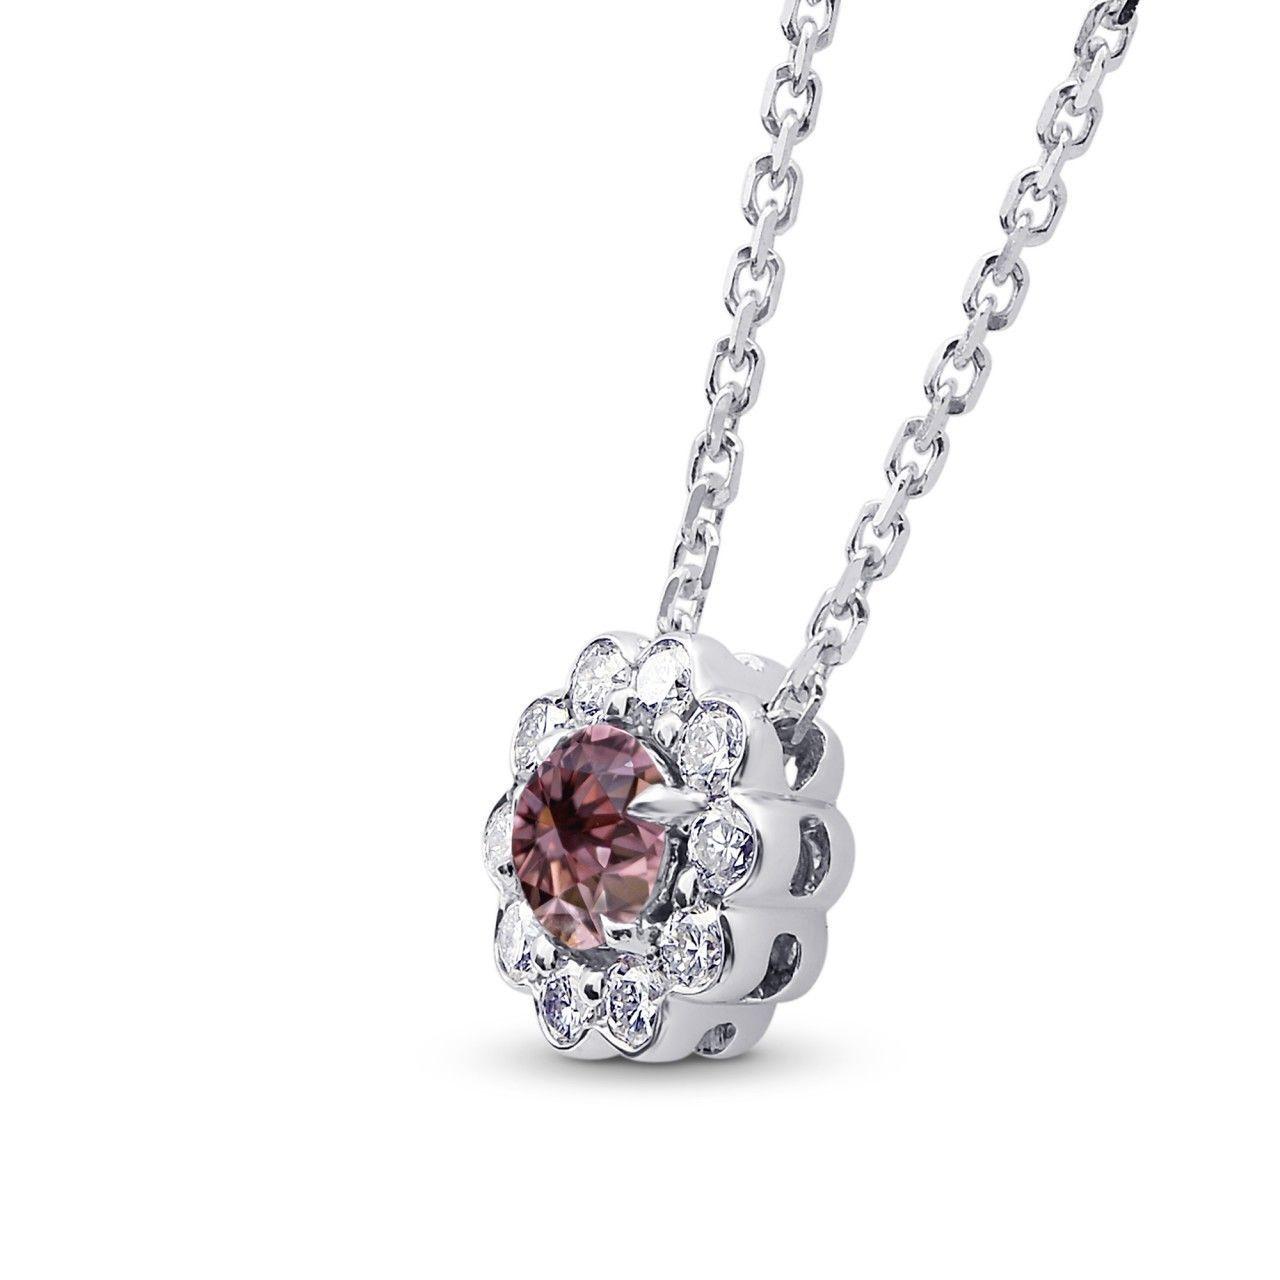 0.45Cts Pink Diamond Halo Pendant Necklace Argyle Set in 18K  White Gold GIA